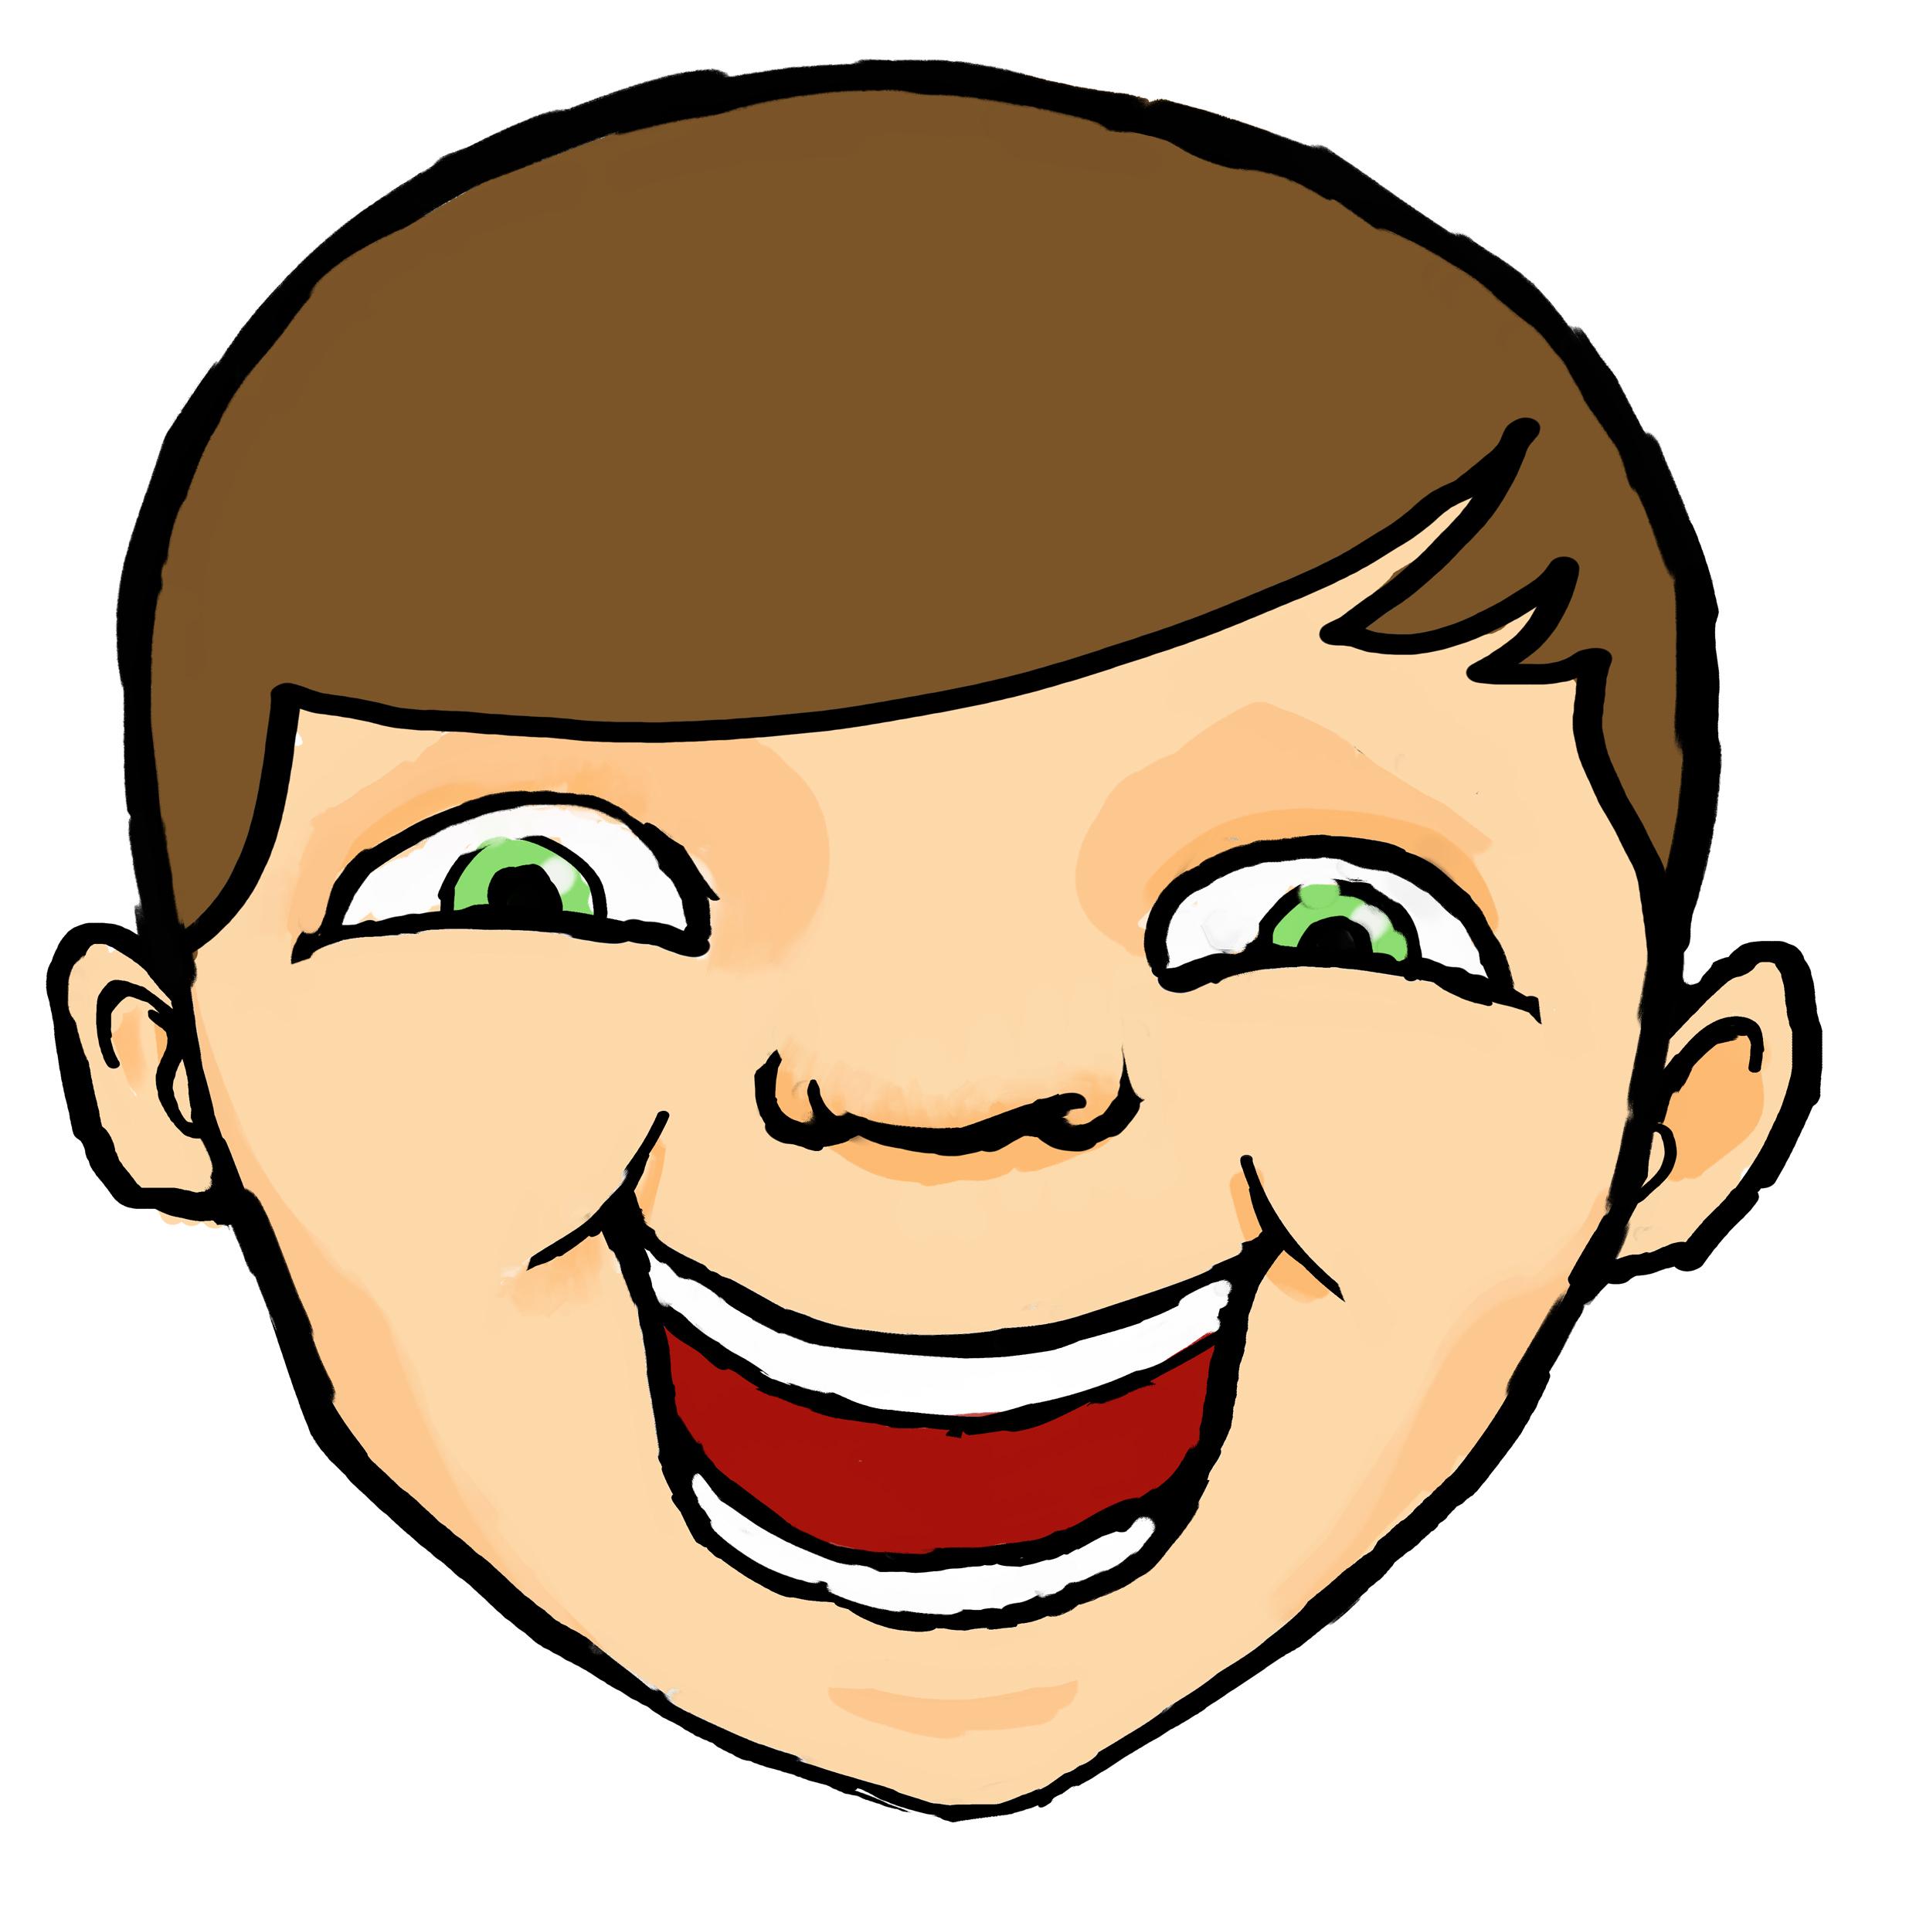 Face clipart Clipart happy%20kids%20face%20clipart Kids Happy Panda